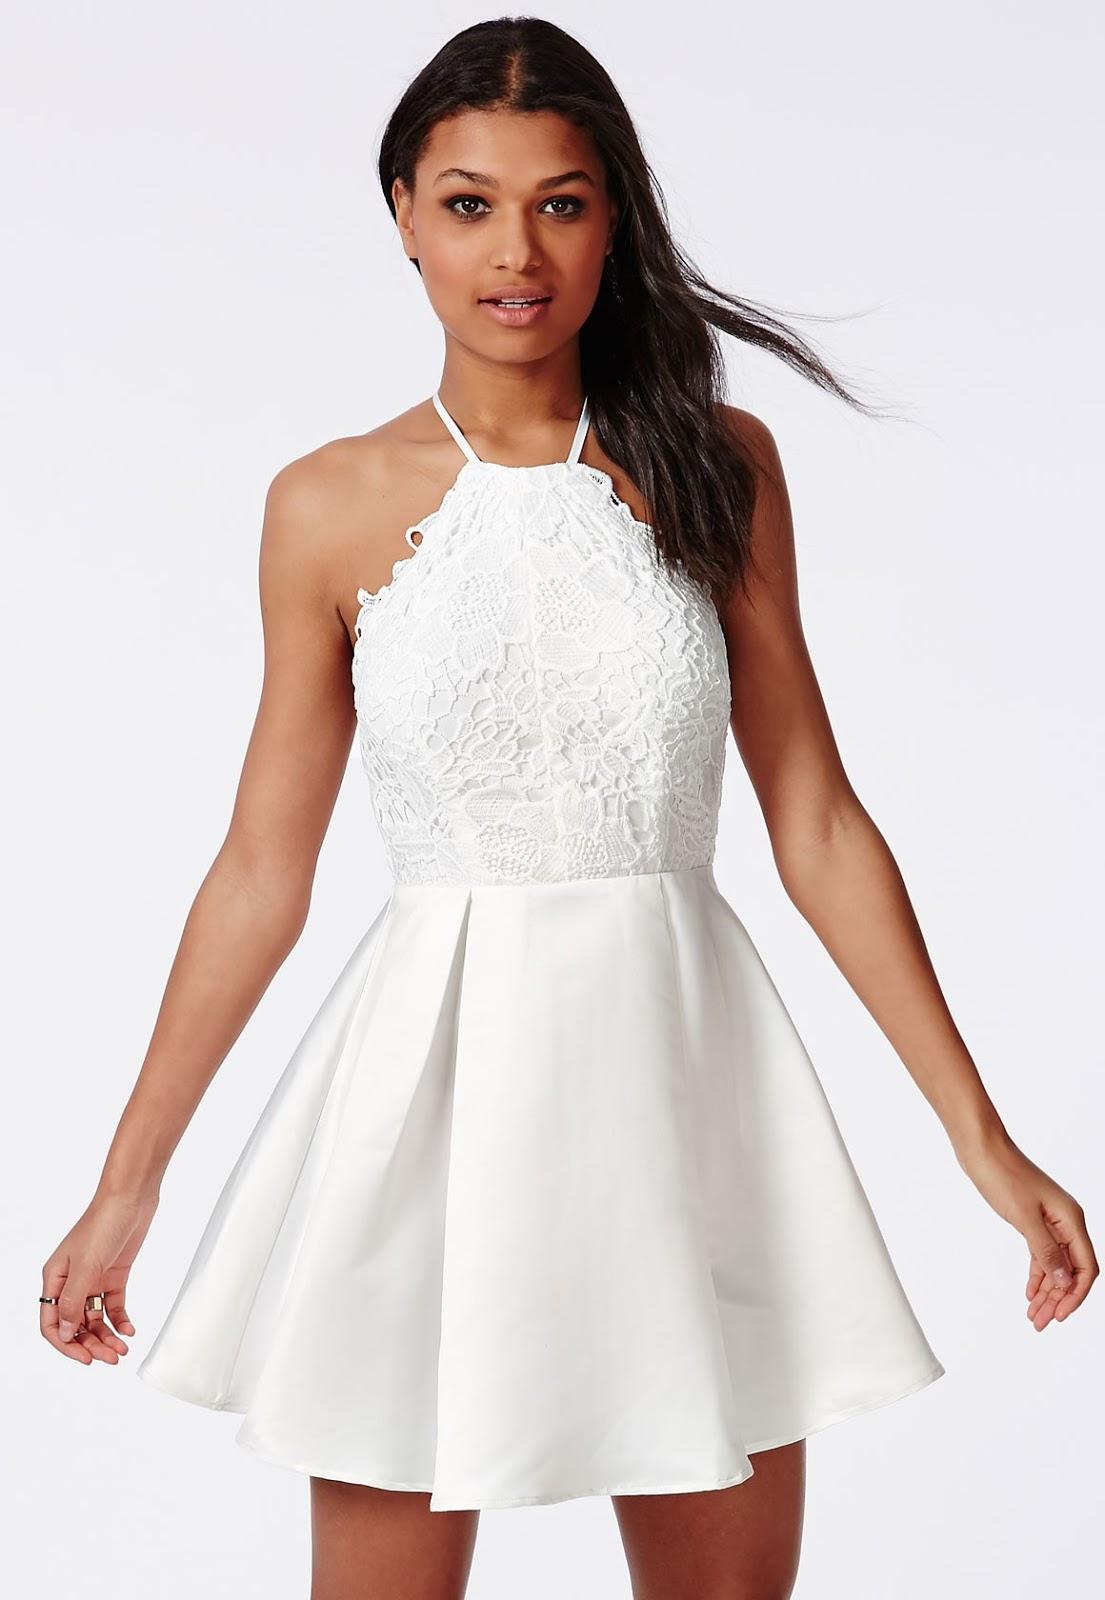 84942d6d70 Excelentes vestidos de fiesta para ir de boda